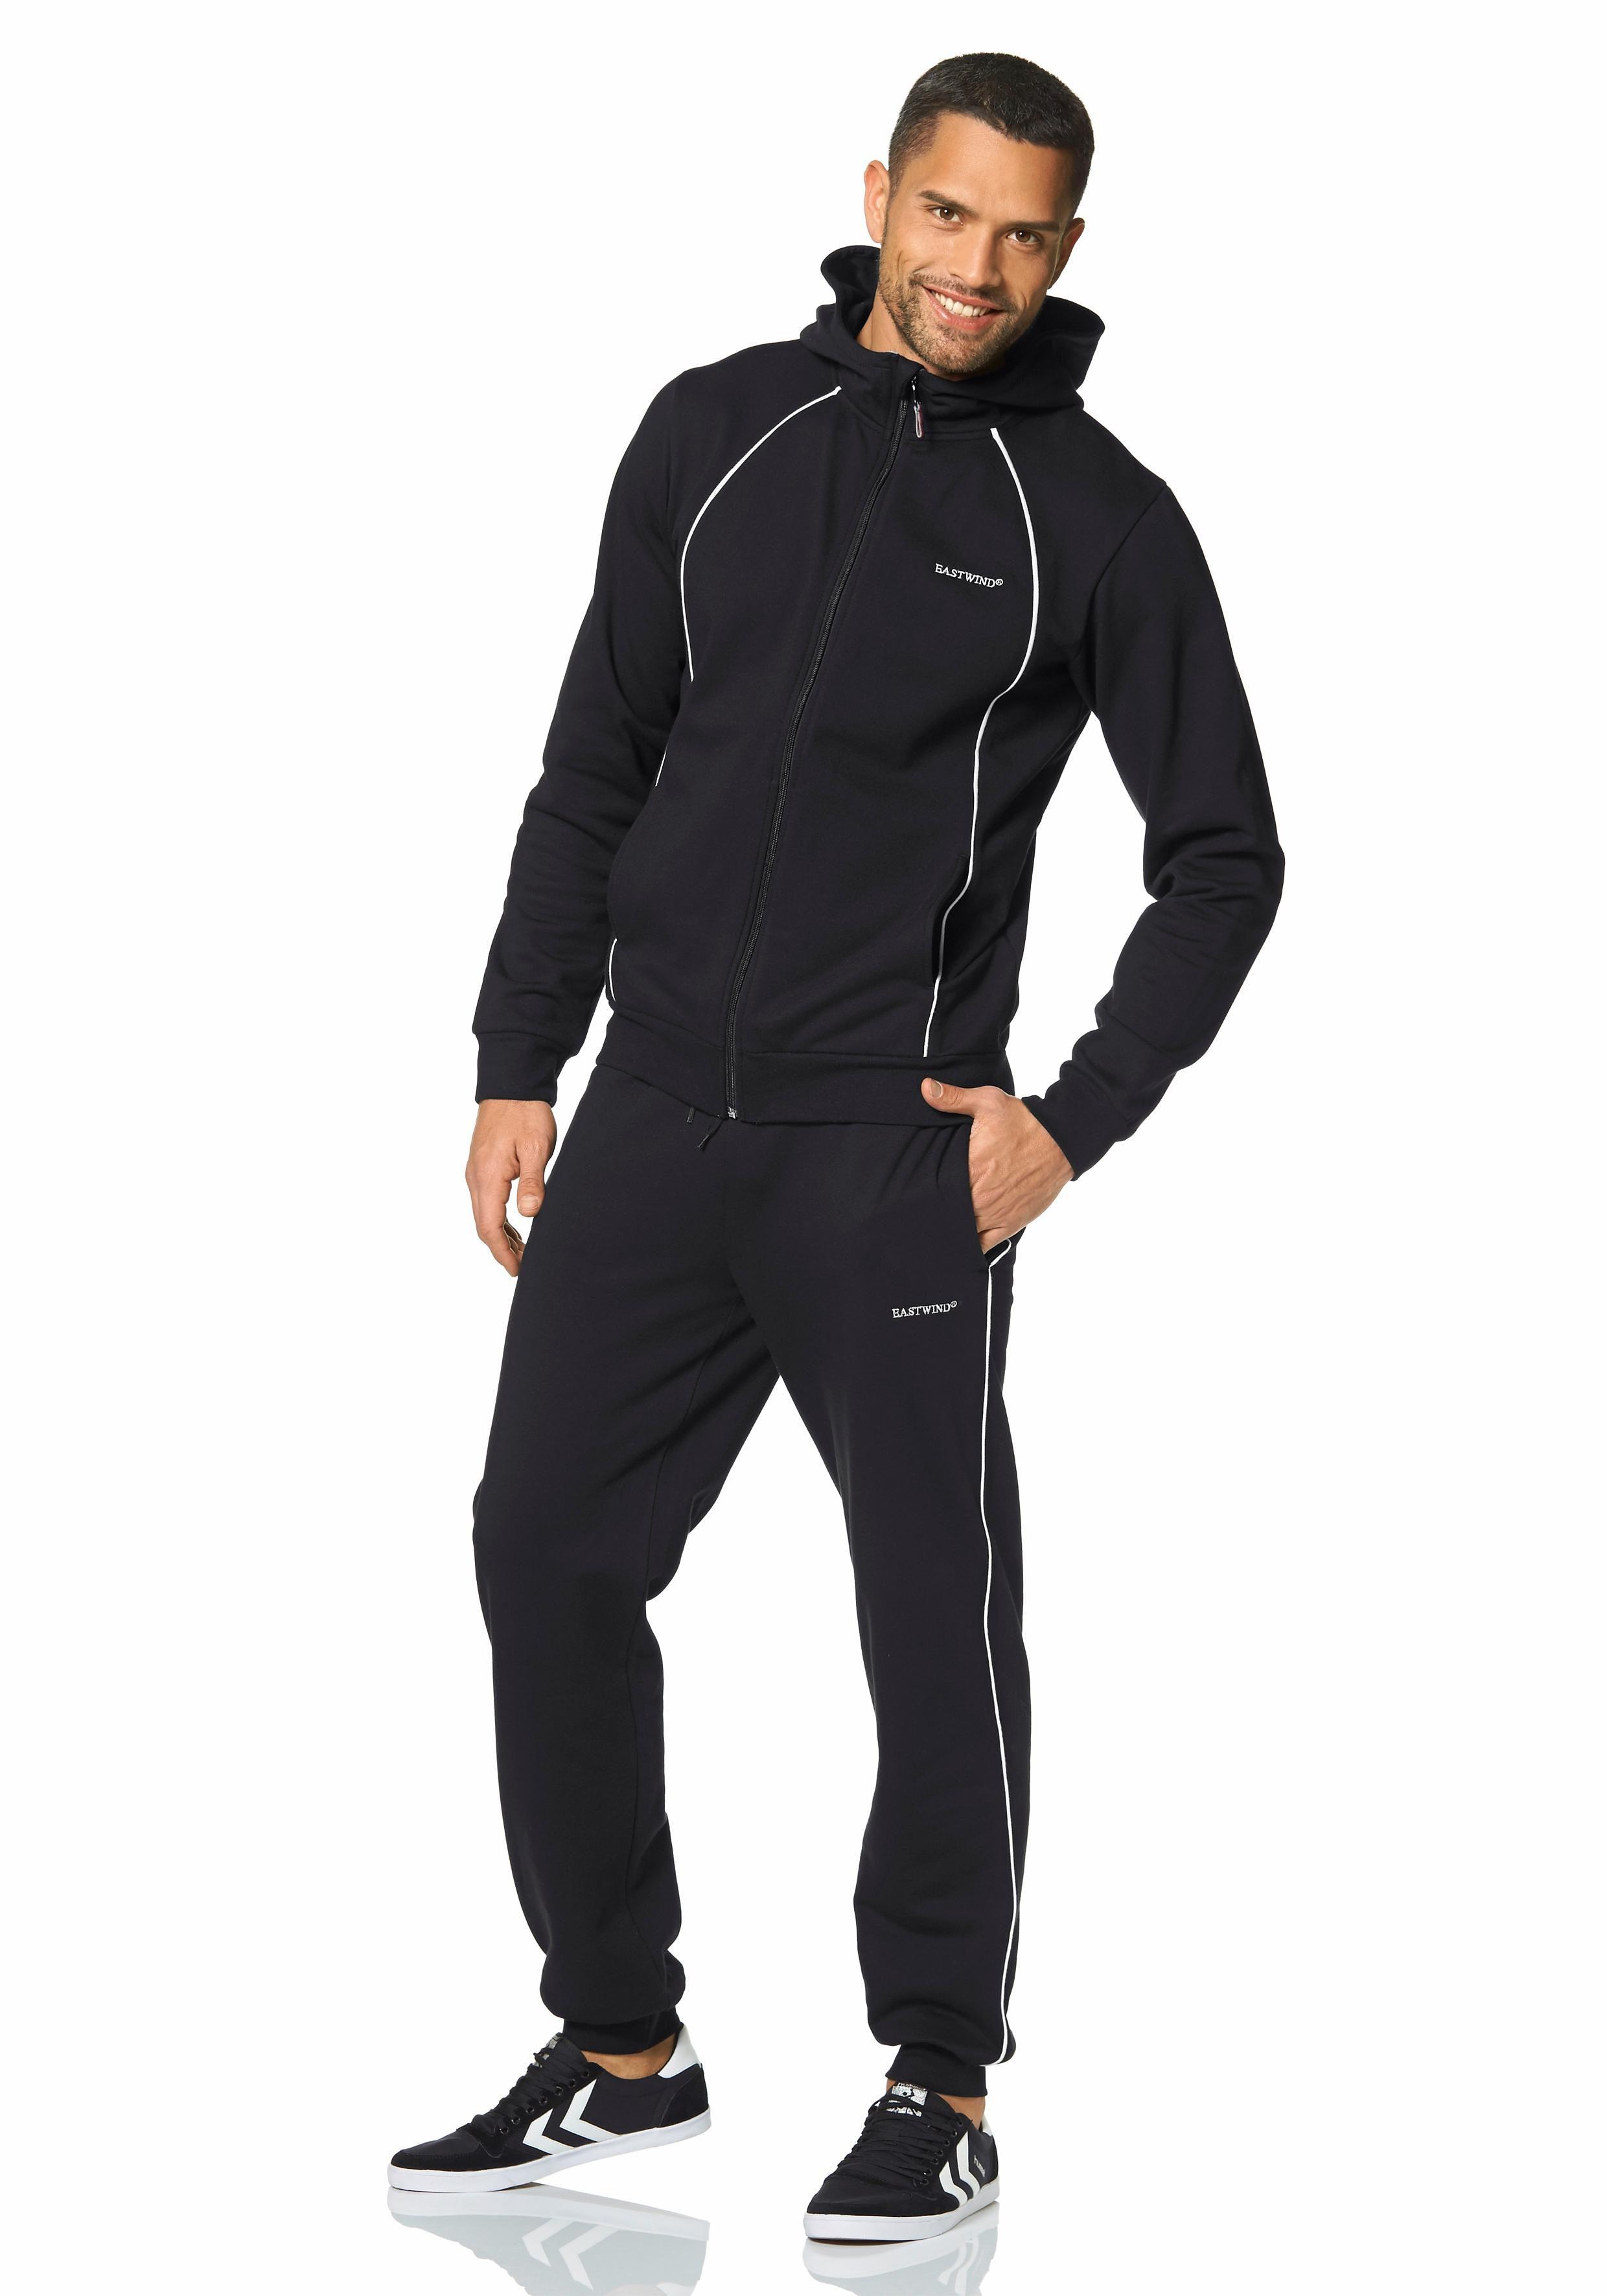 Jogginganzug Jogginganzug Trainingsanzug (set 2 Tlg)  Fitness Fitness Fitness Bekleidung Herren 4f159b